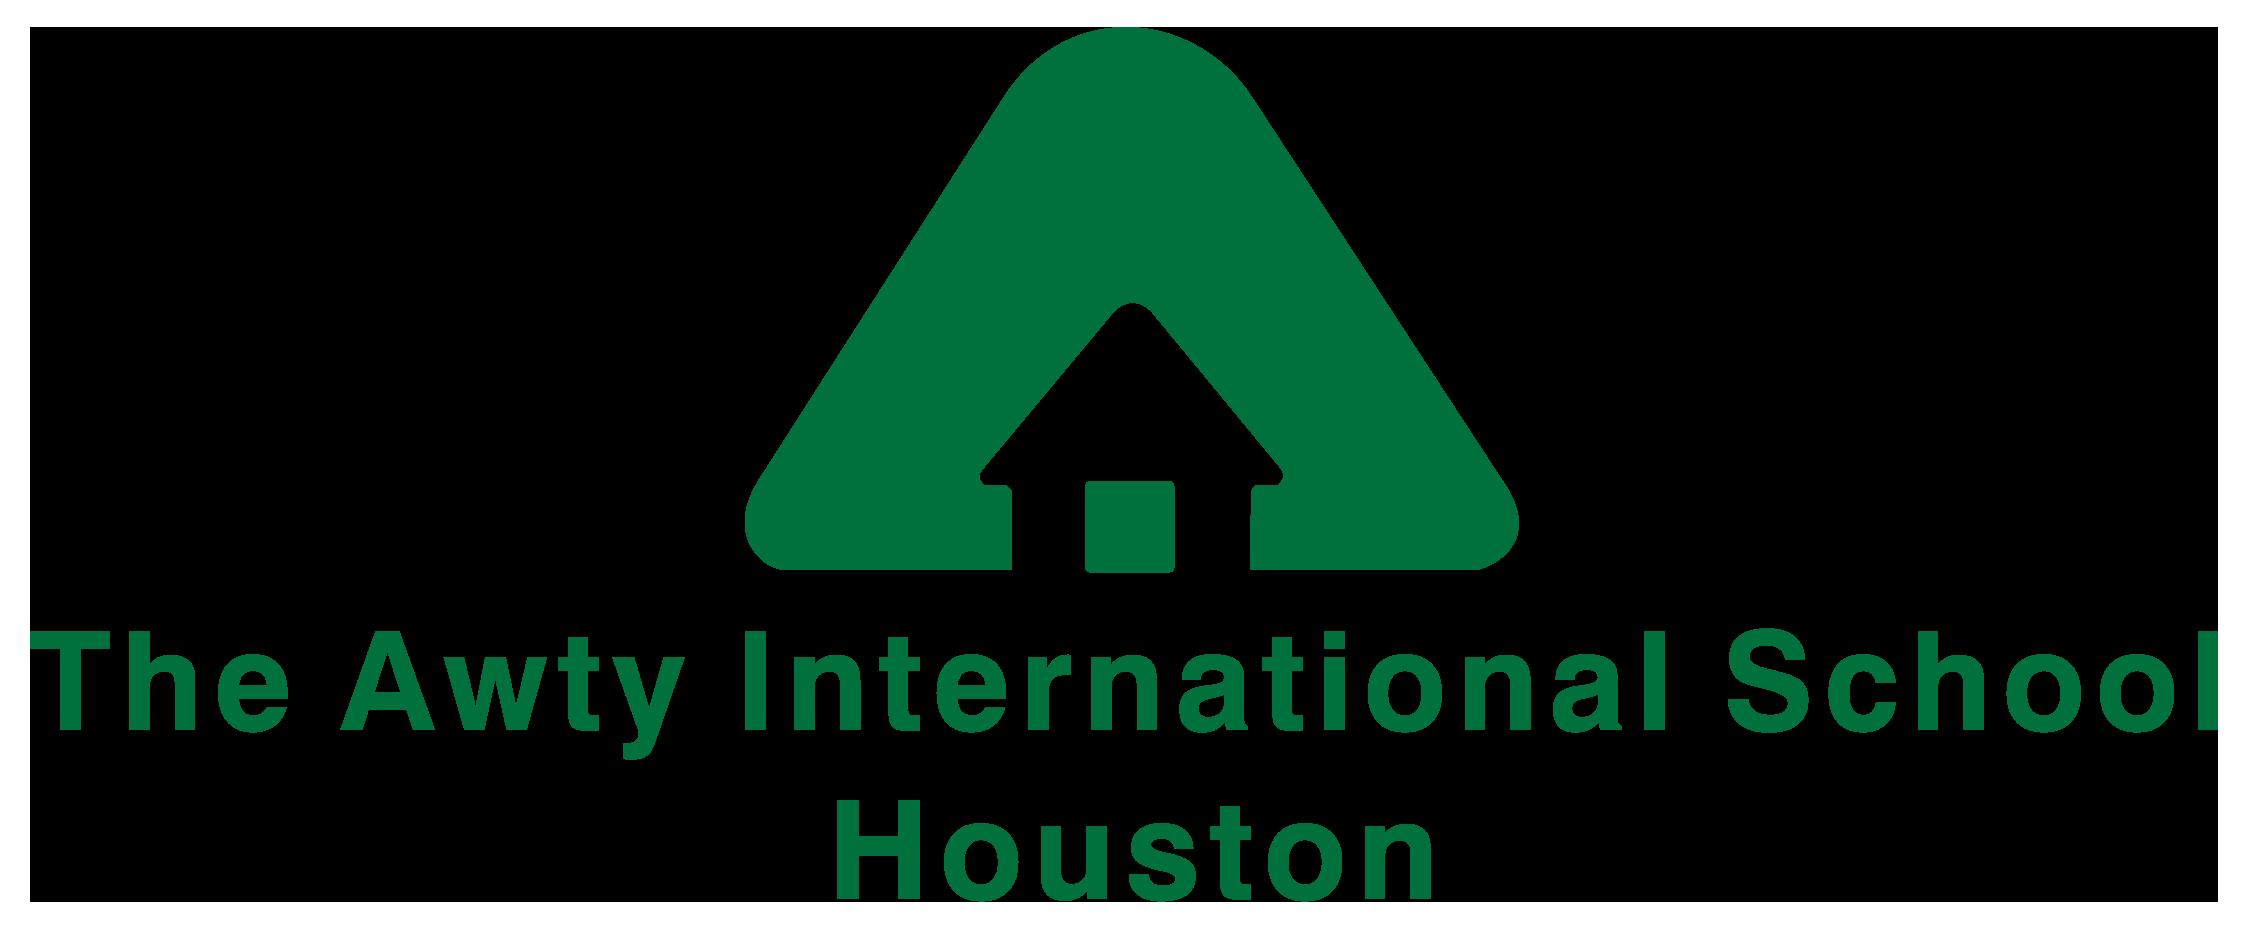 The Awty International School logo